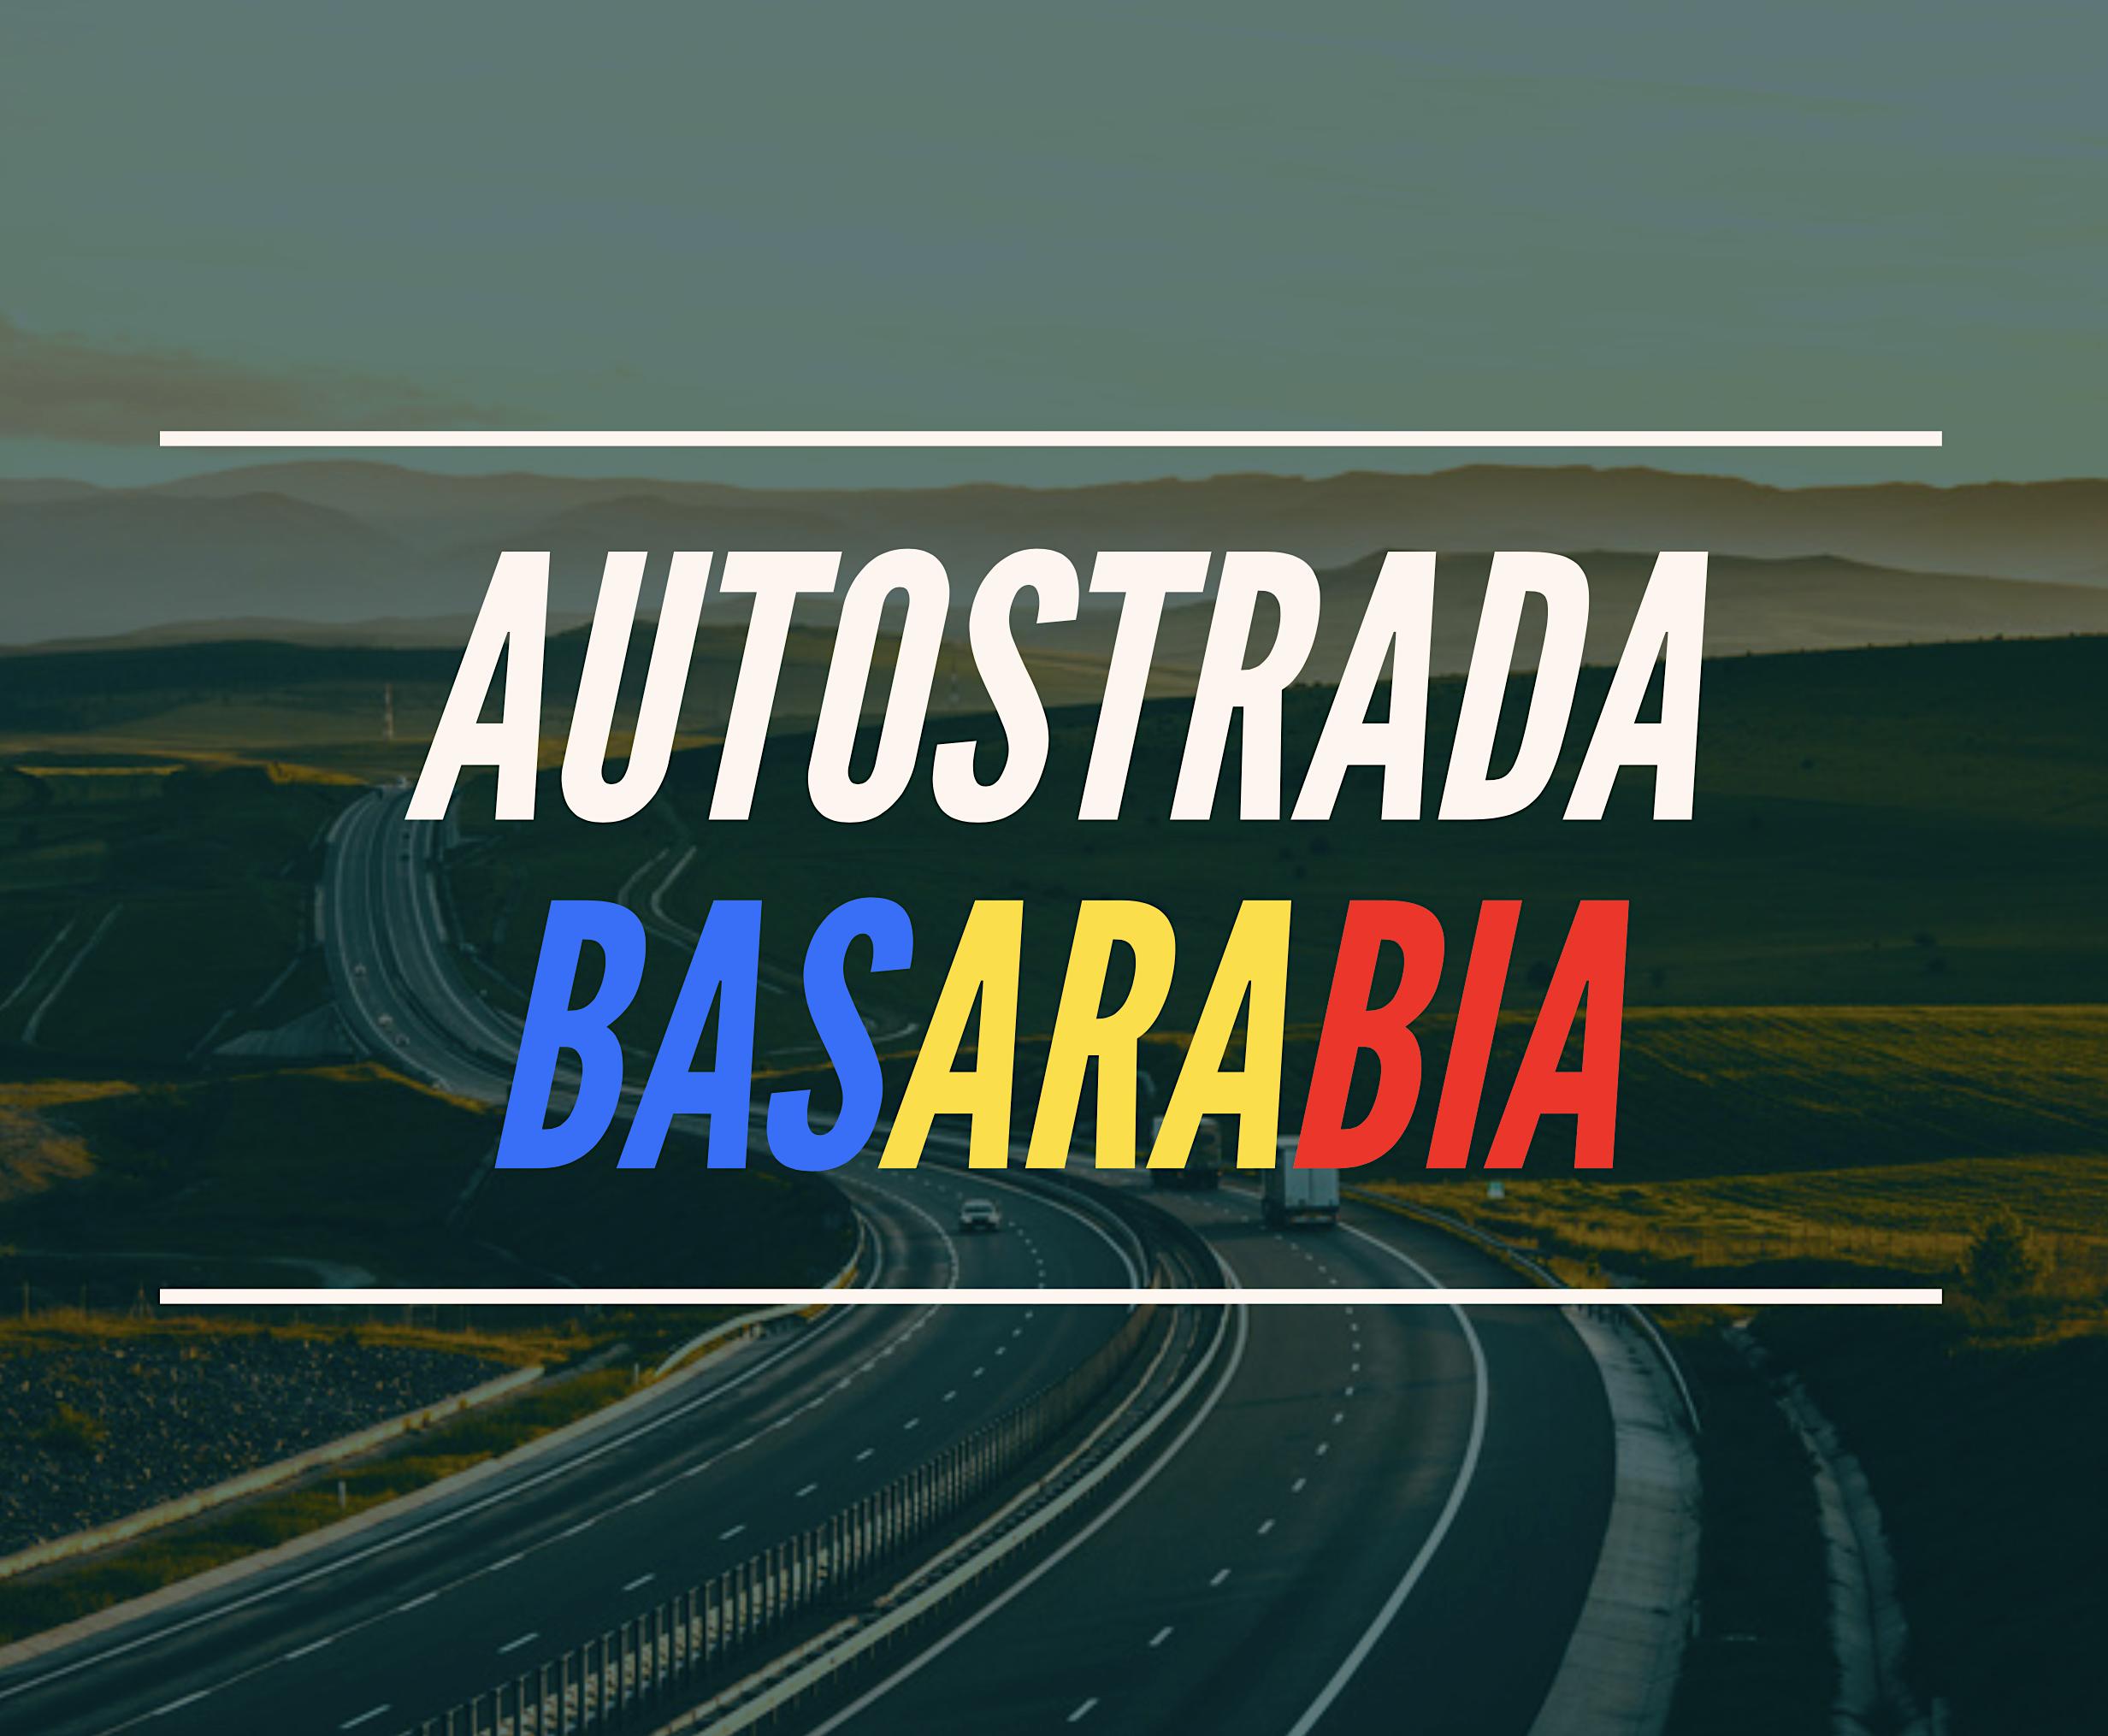 Autostrada Basarabia